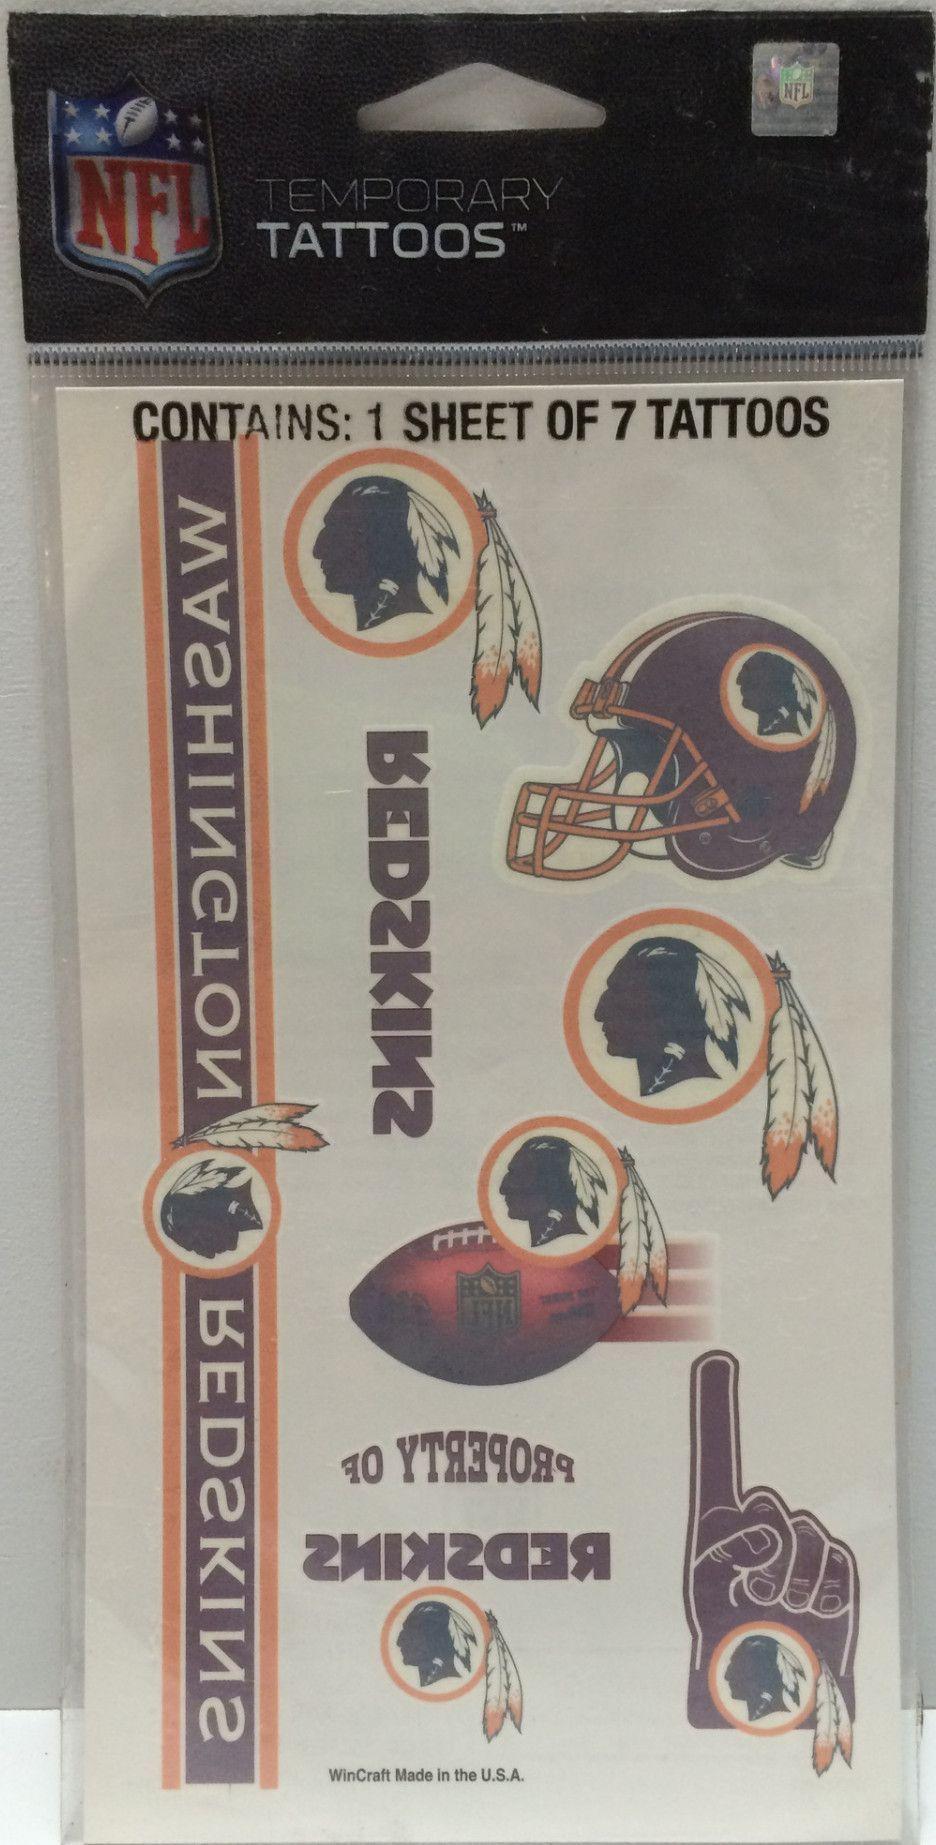 washington football team merchandise near me